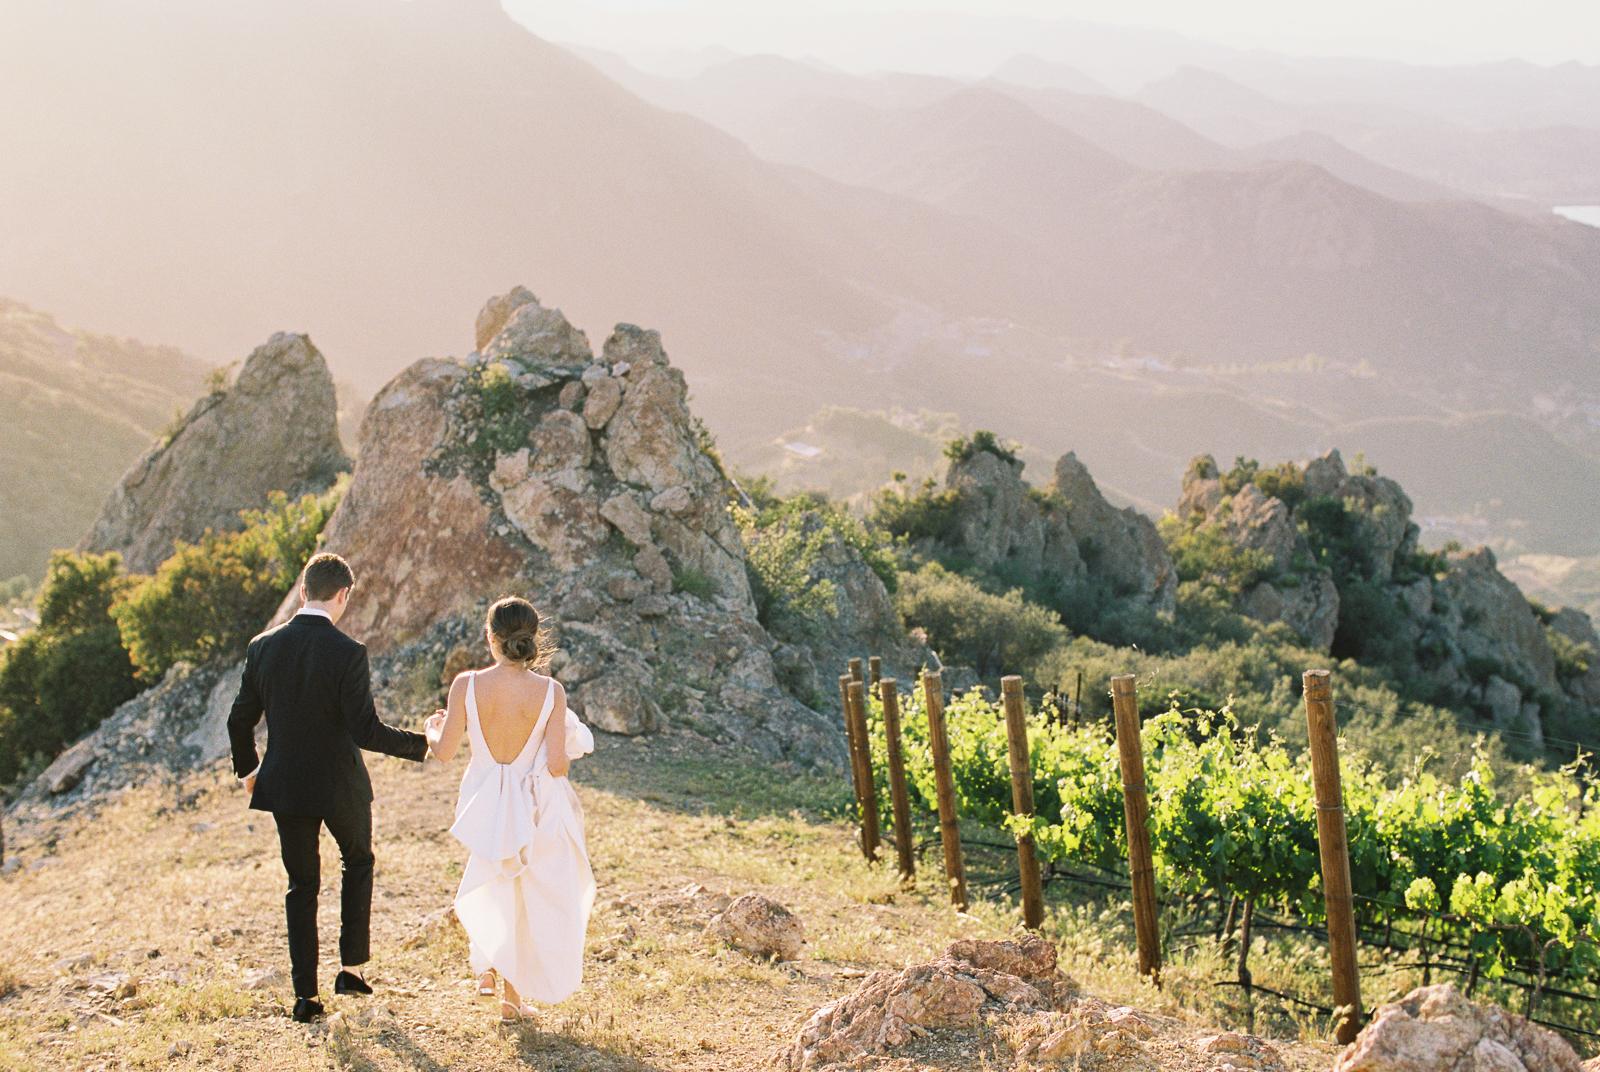 Los_Angeles_Wedding_Photographer-2-5.jpg